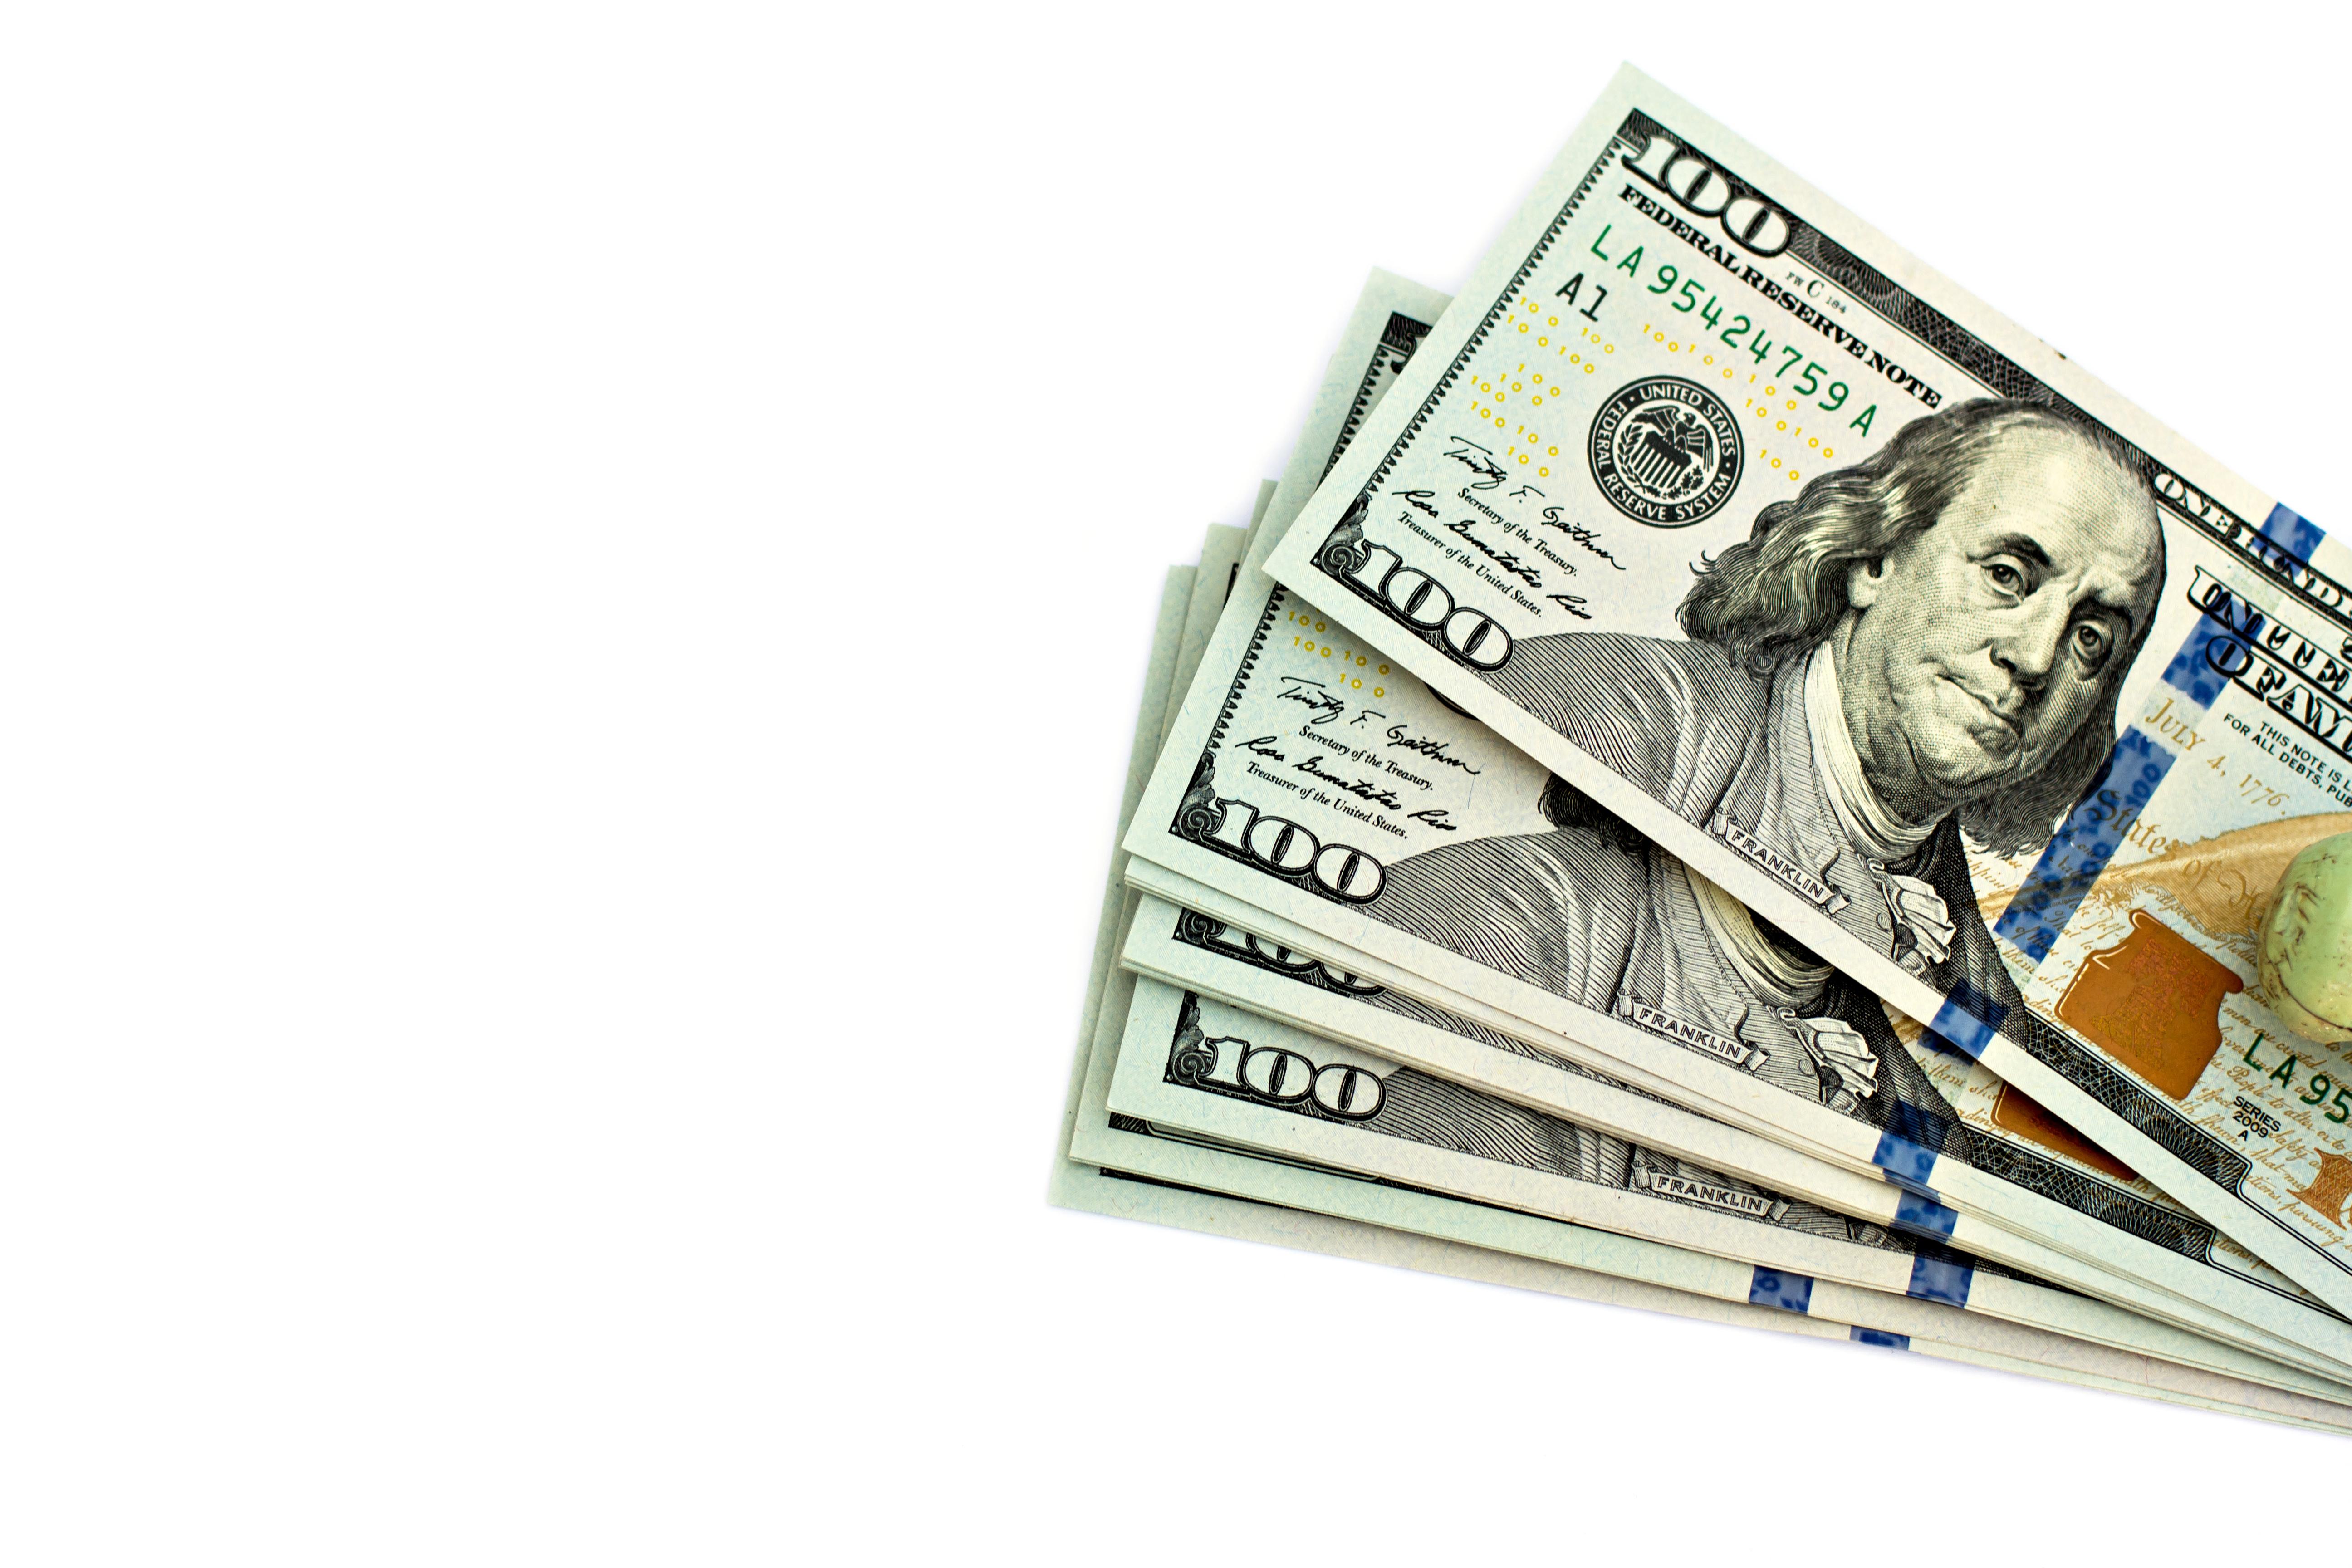 AdobeStock_82610485 - Money